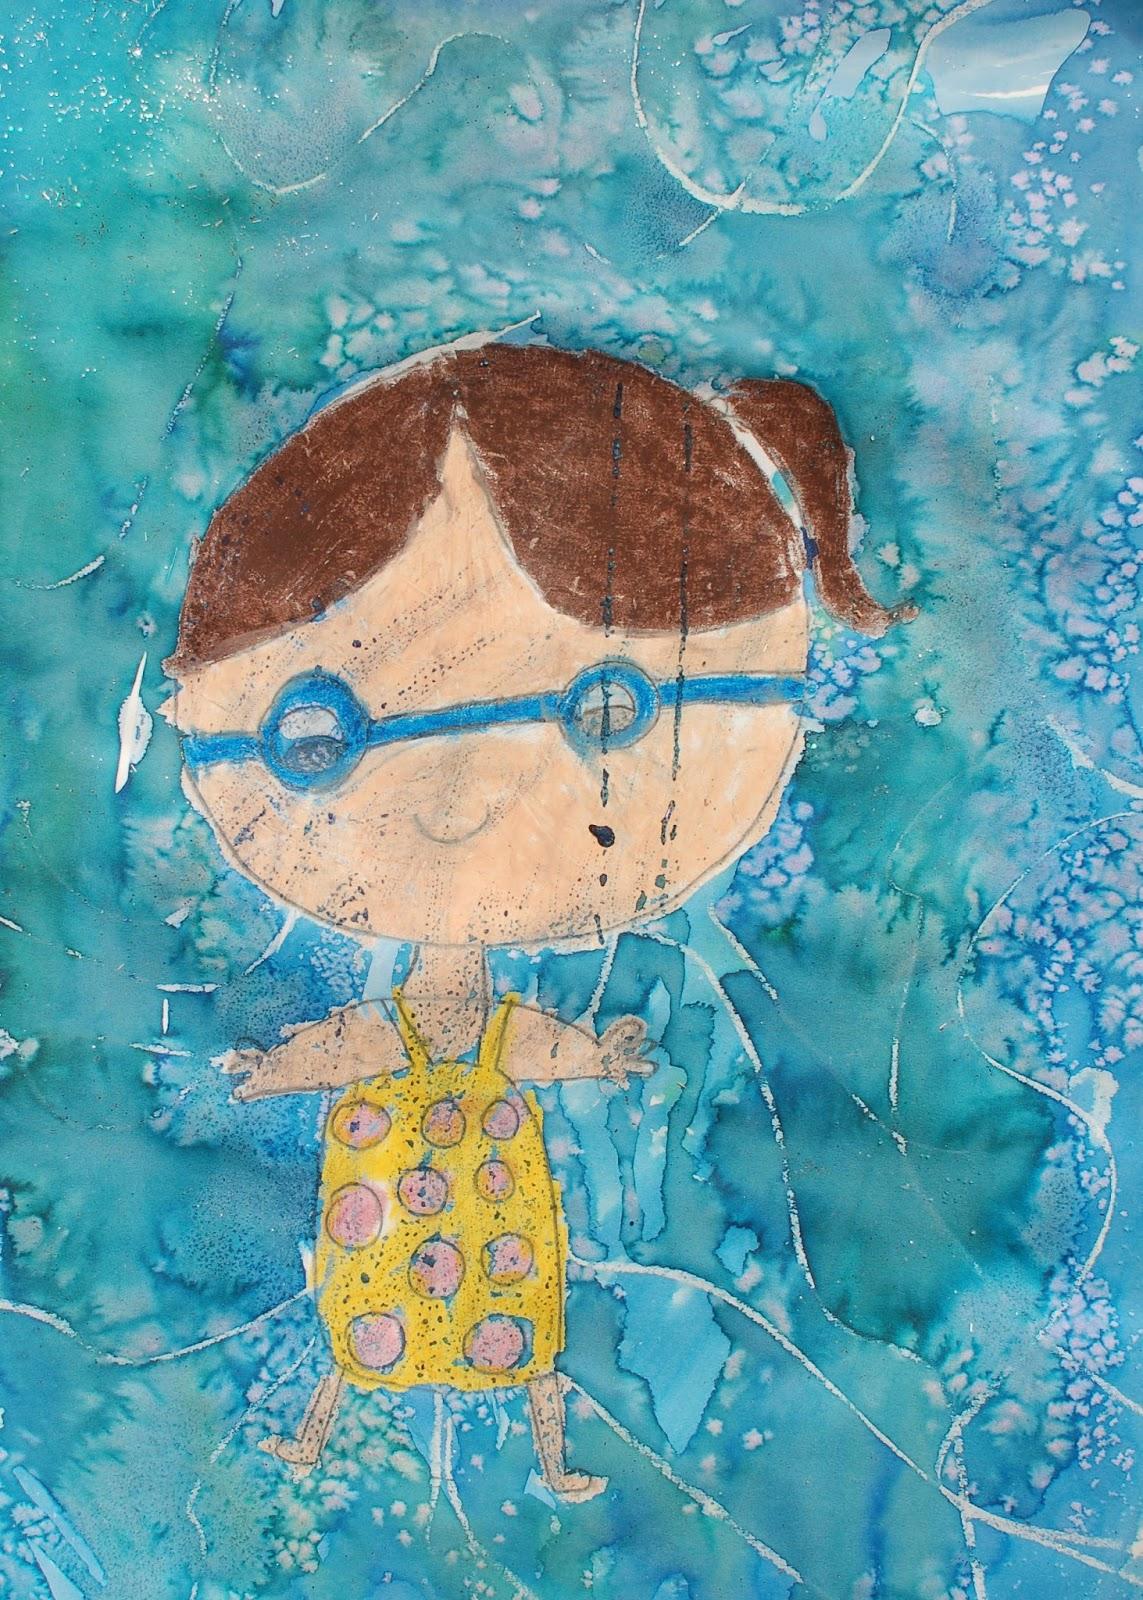 Sunnyside Art House Underwater Portraits In The Style Of David Hockney